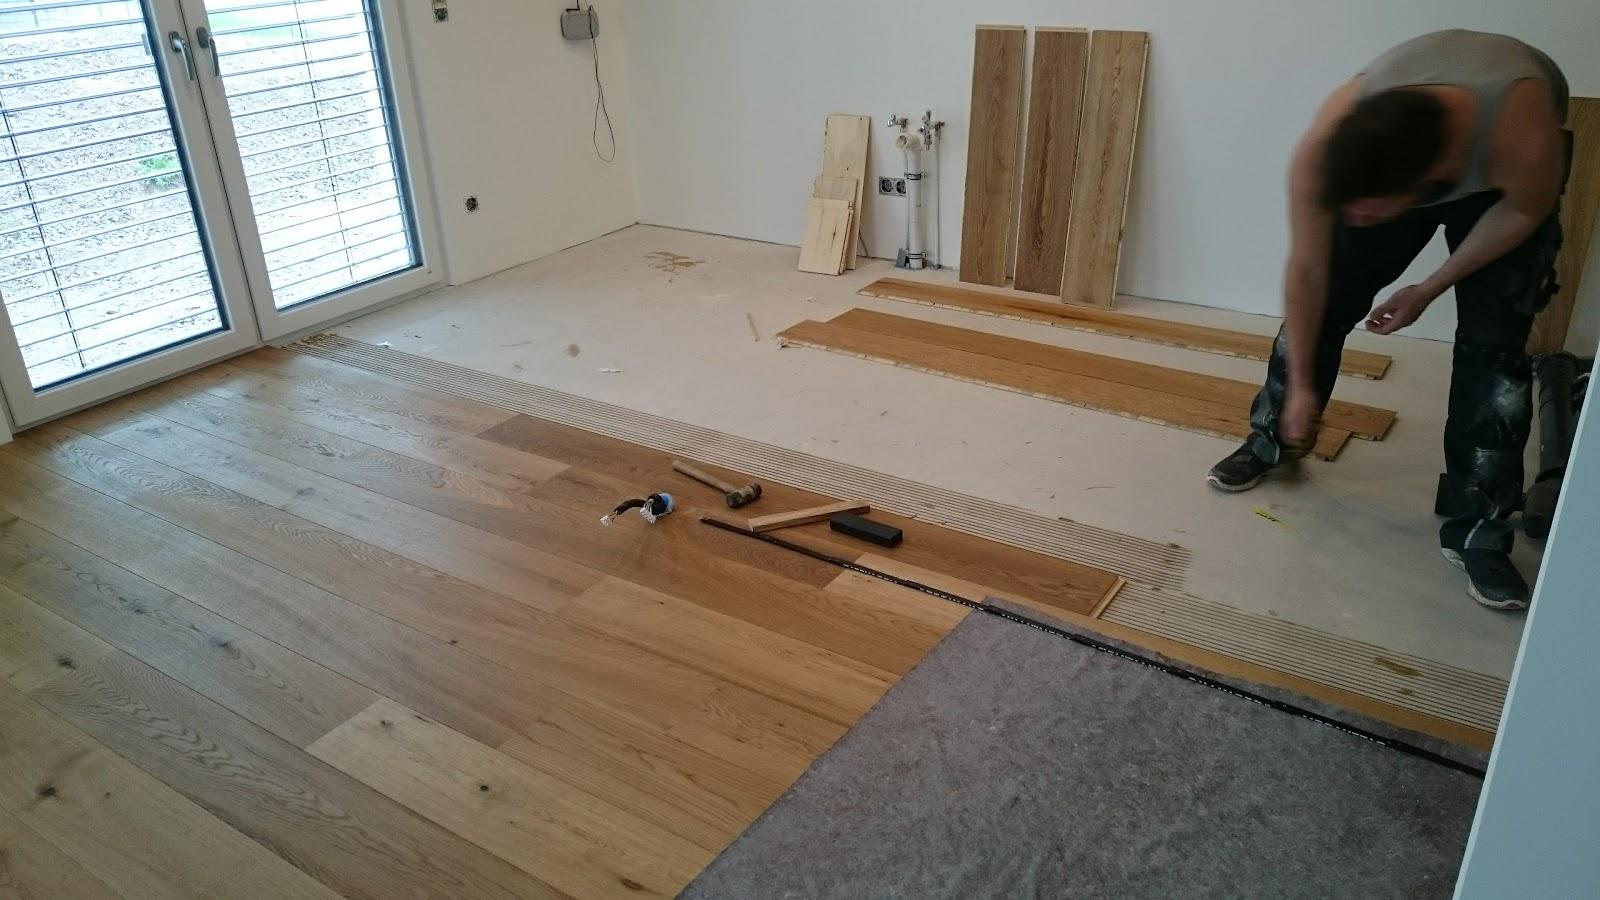 Holz Auf Holz: Parkett Fertig, Jetzt Kommt Der Kork